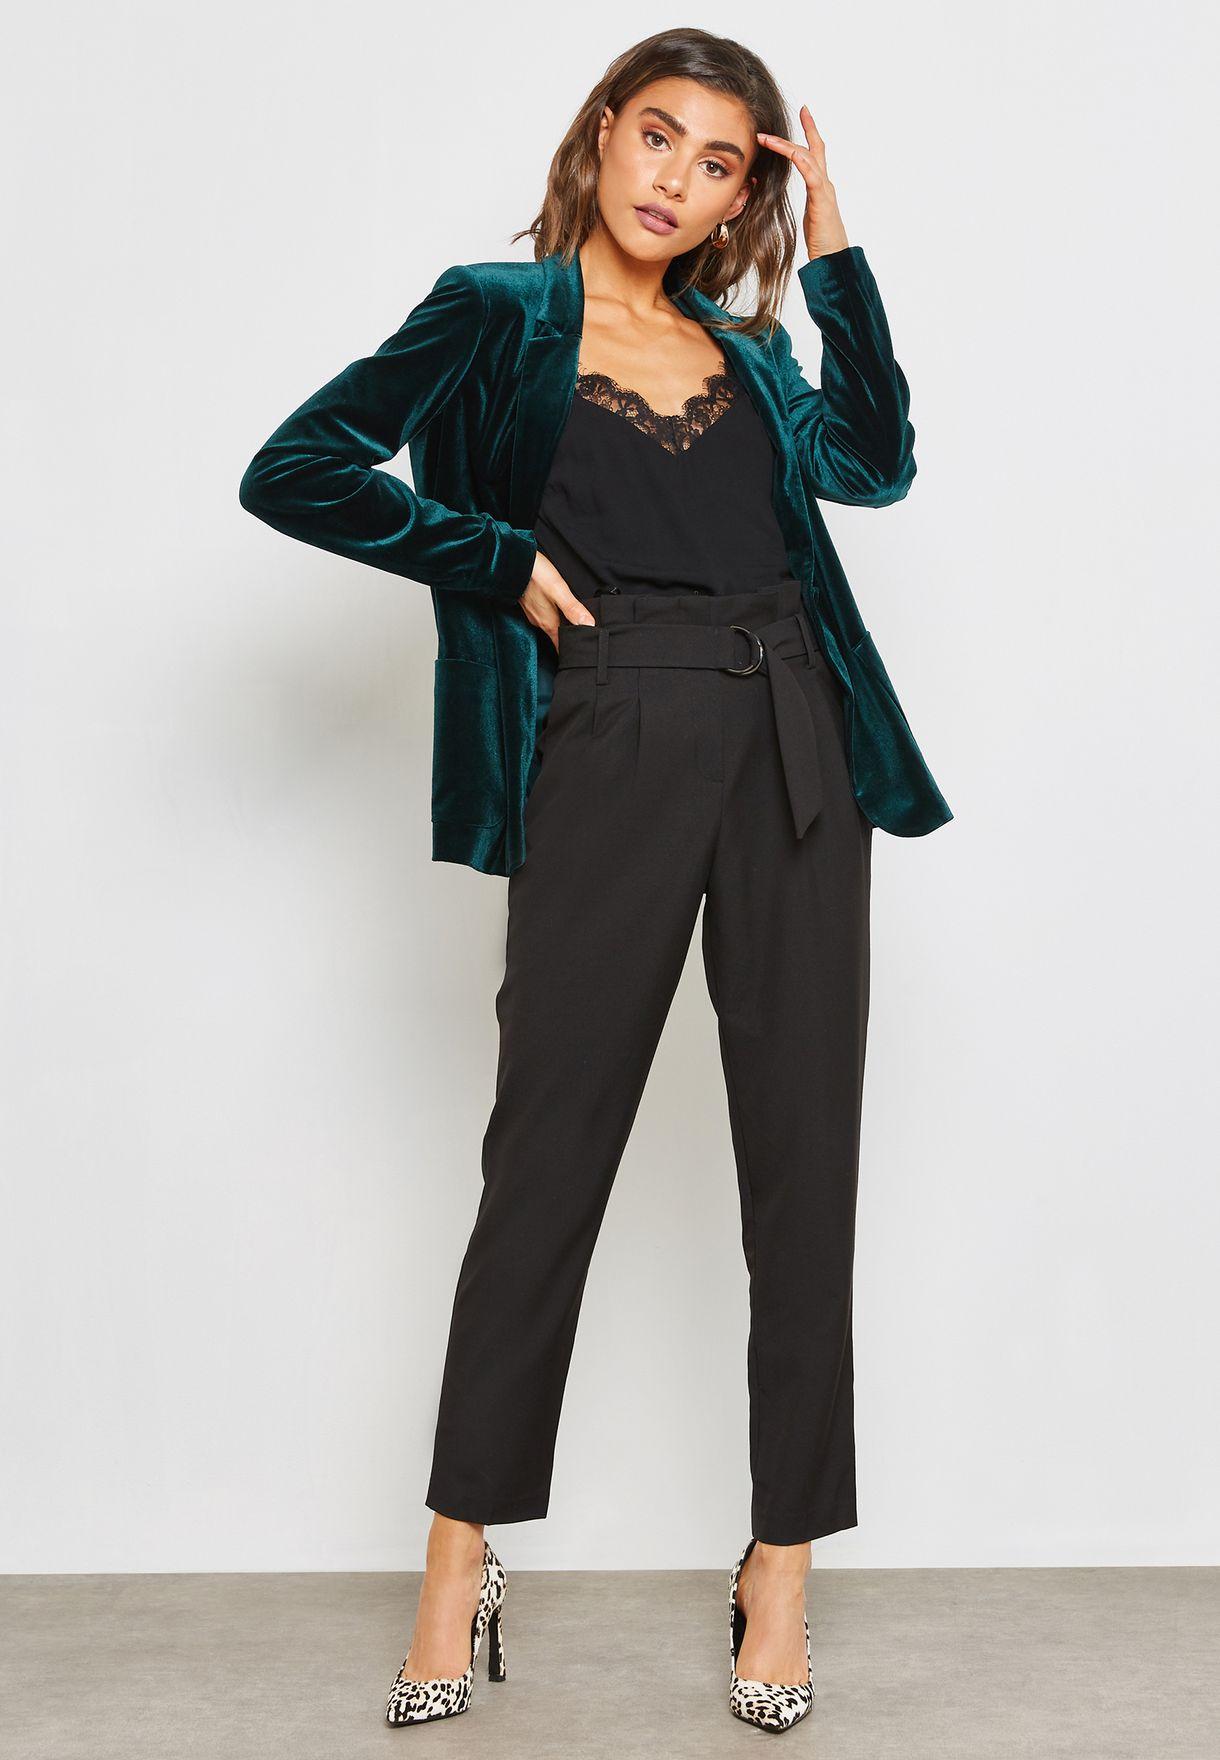 79eea3656ee5 Shop Miss Selfridge black Paperbag Pants 43S60XBLK for Women in ...